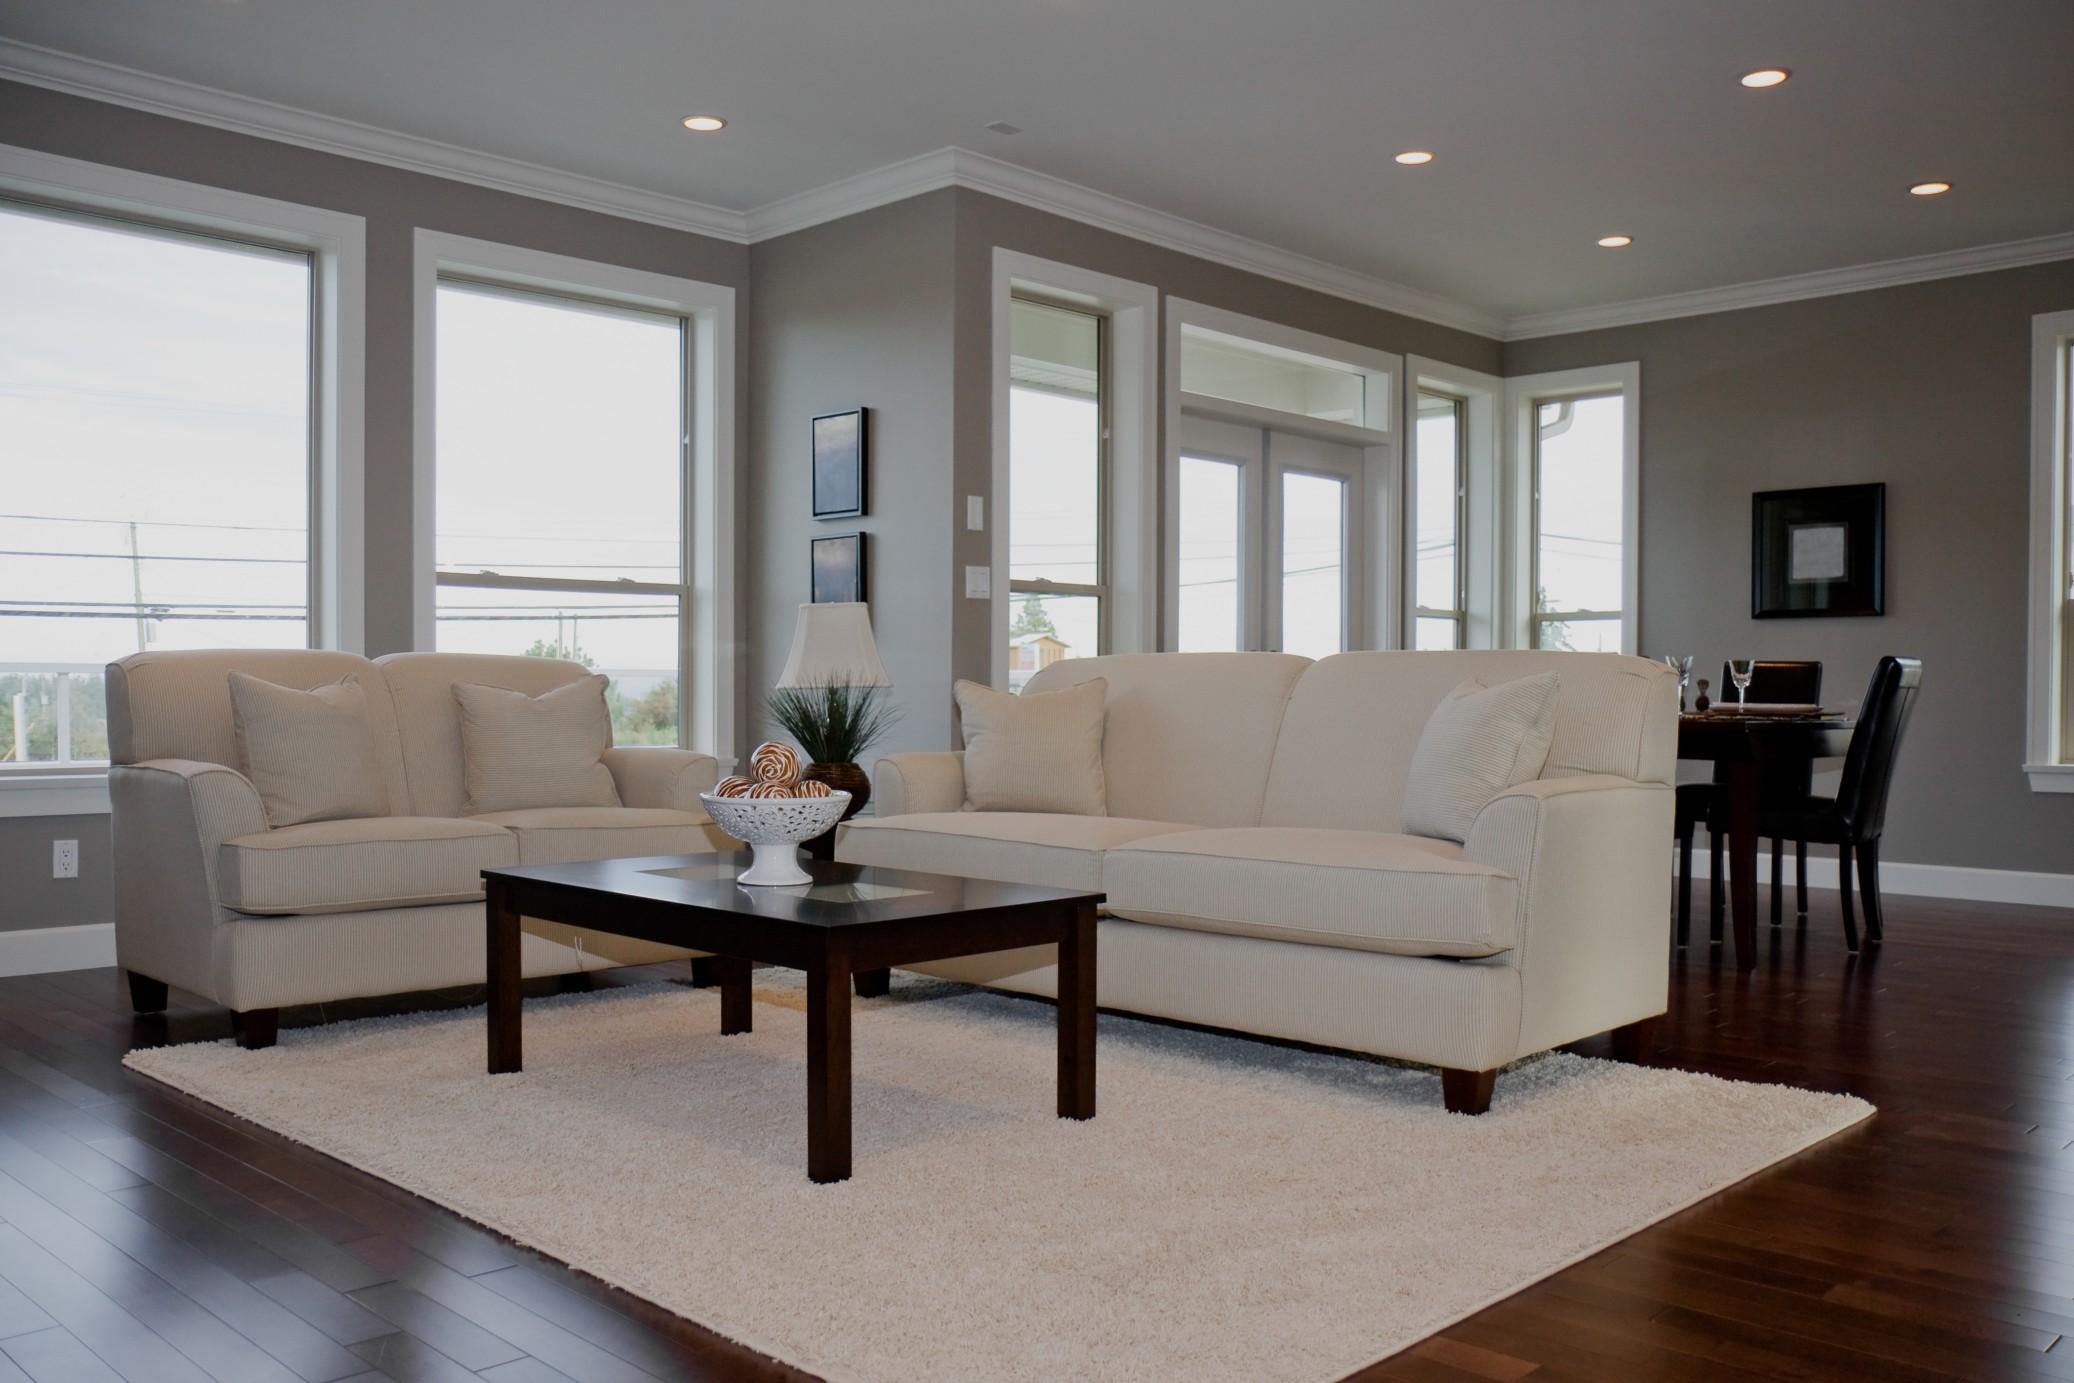 Tappeti moderni fantasie e disegni di tutti i tipi - Disenos de pisos para interiores ...